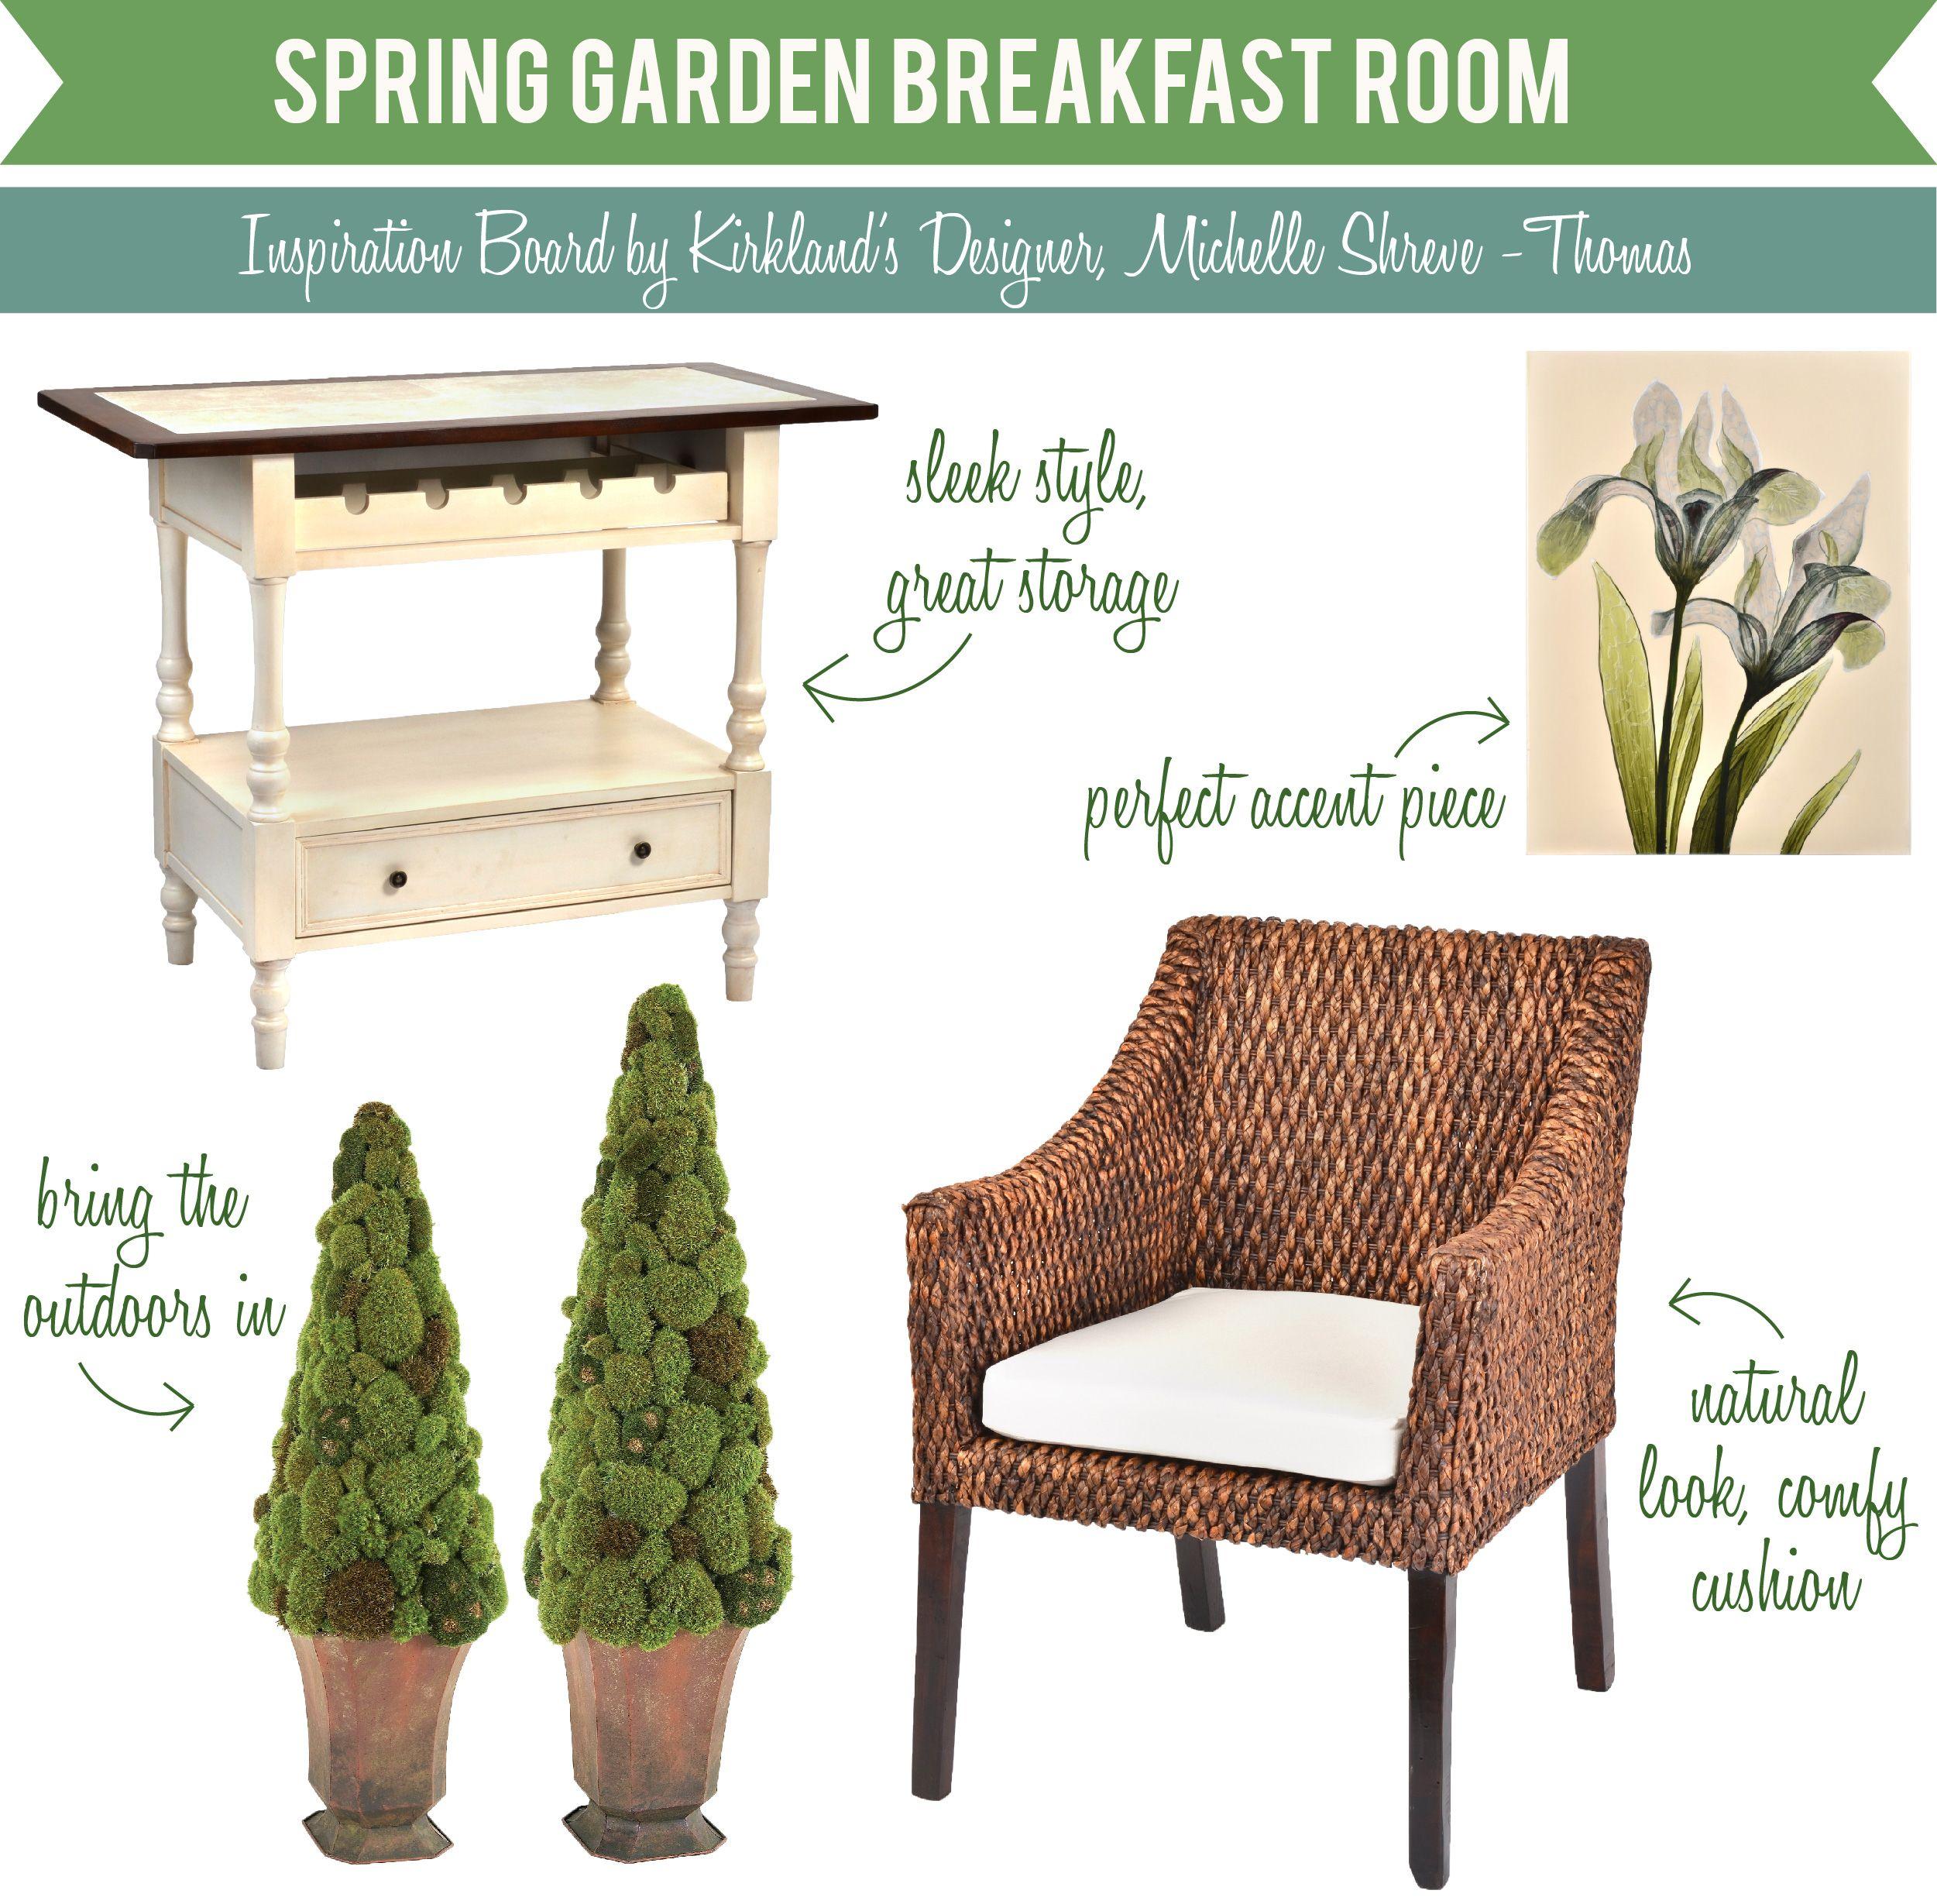 Spring Garden Breakfast Room Inspiration Board #MyKirklands  #kirklands #pinitpretty #pinitprettygiveaway